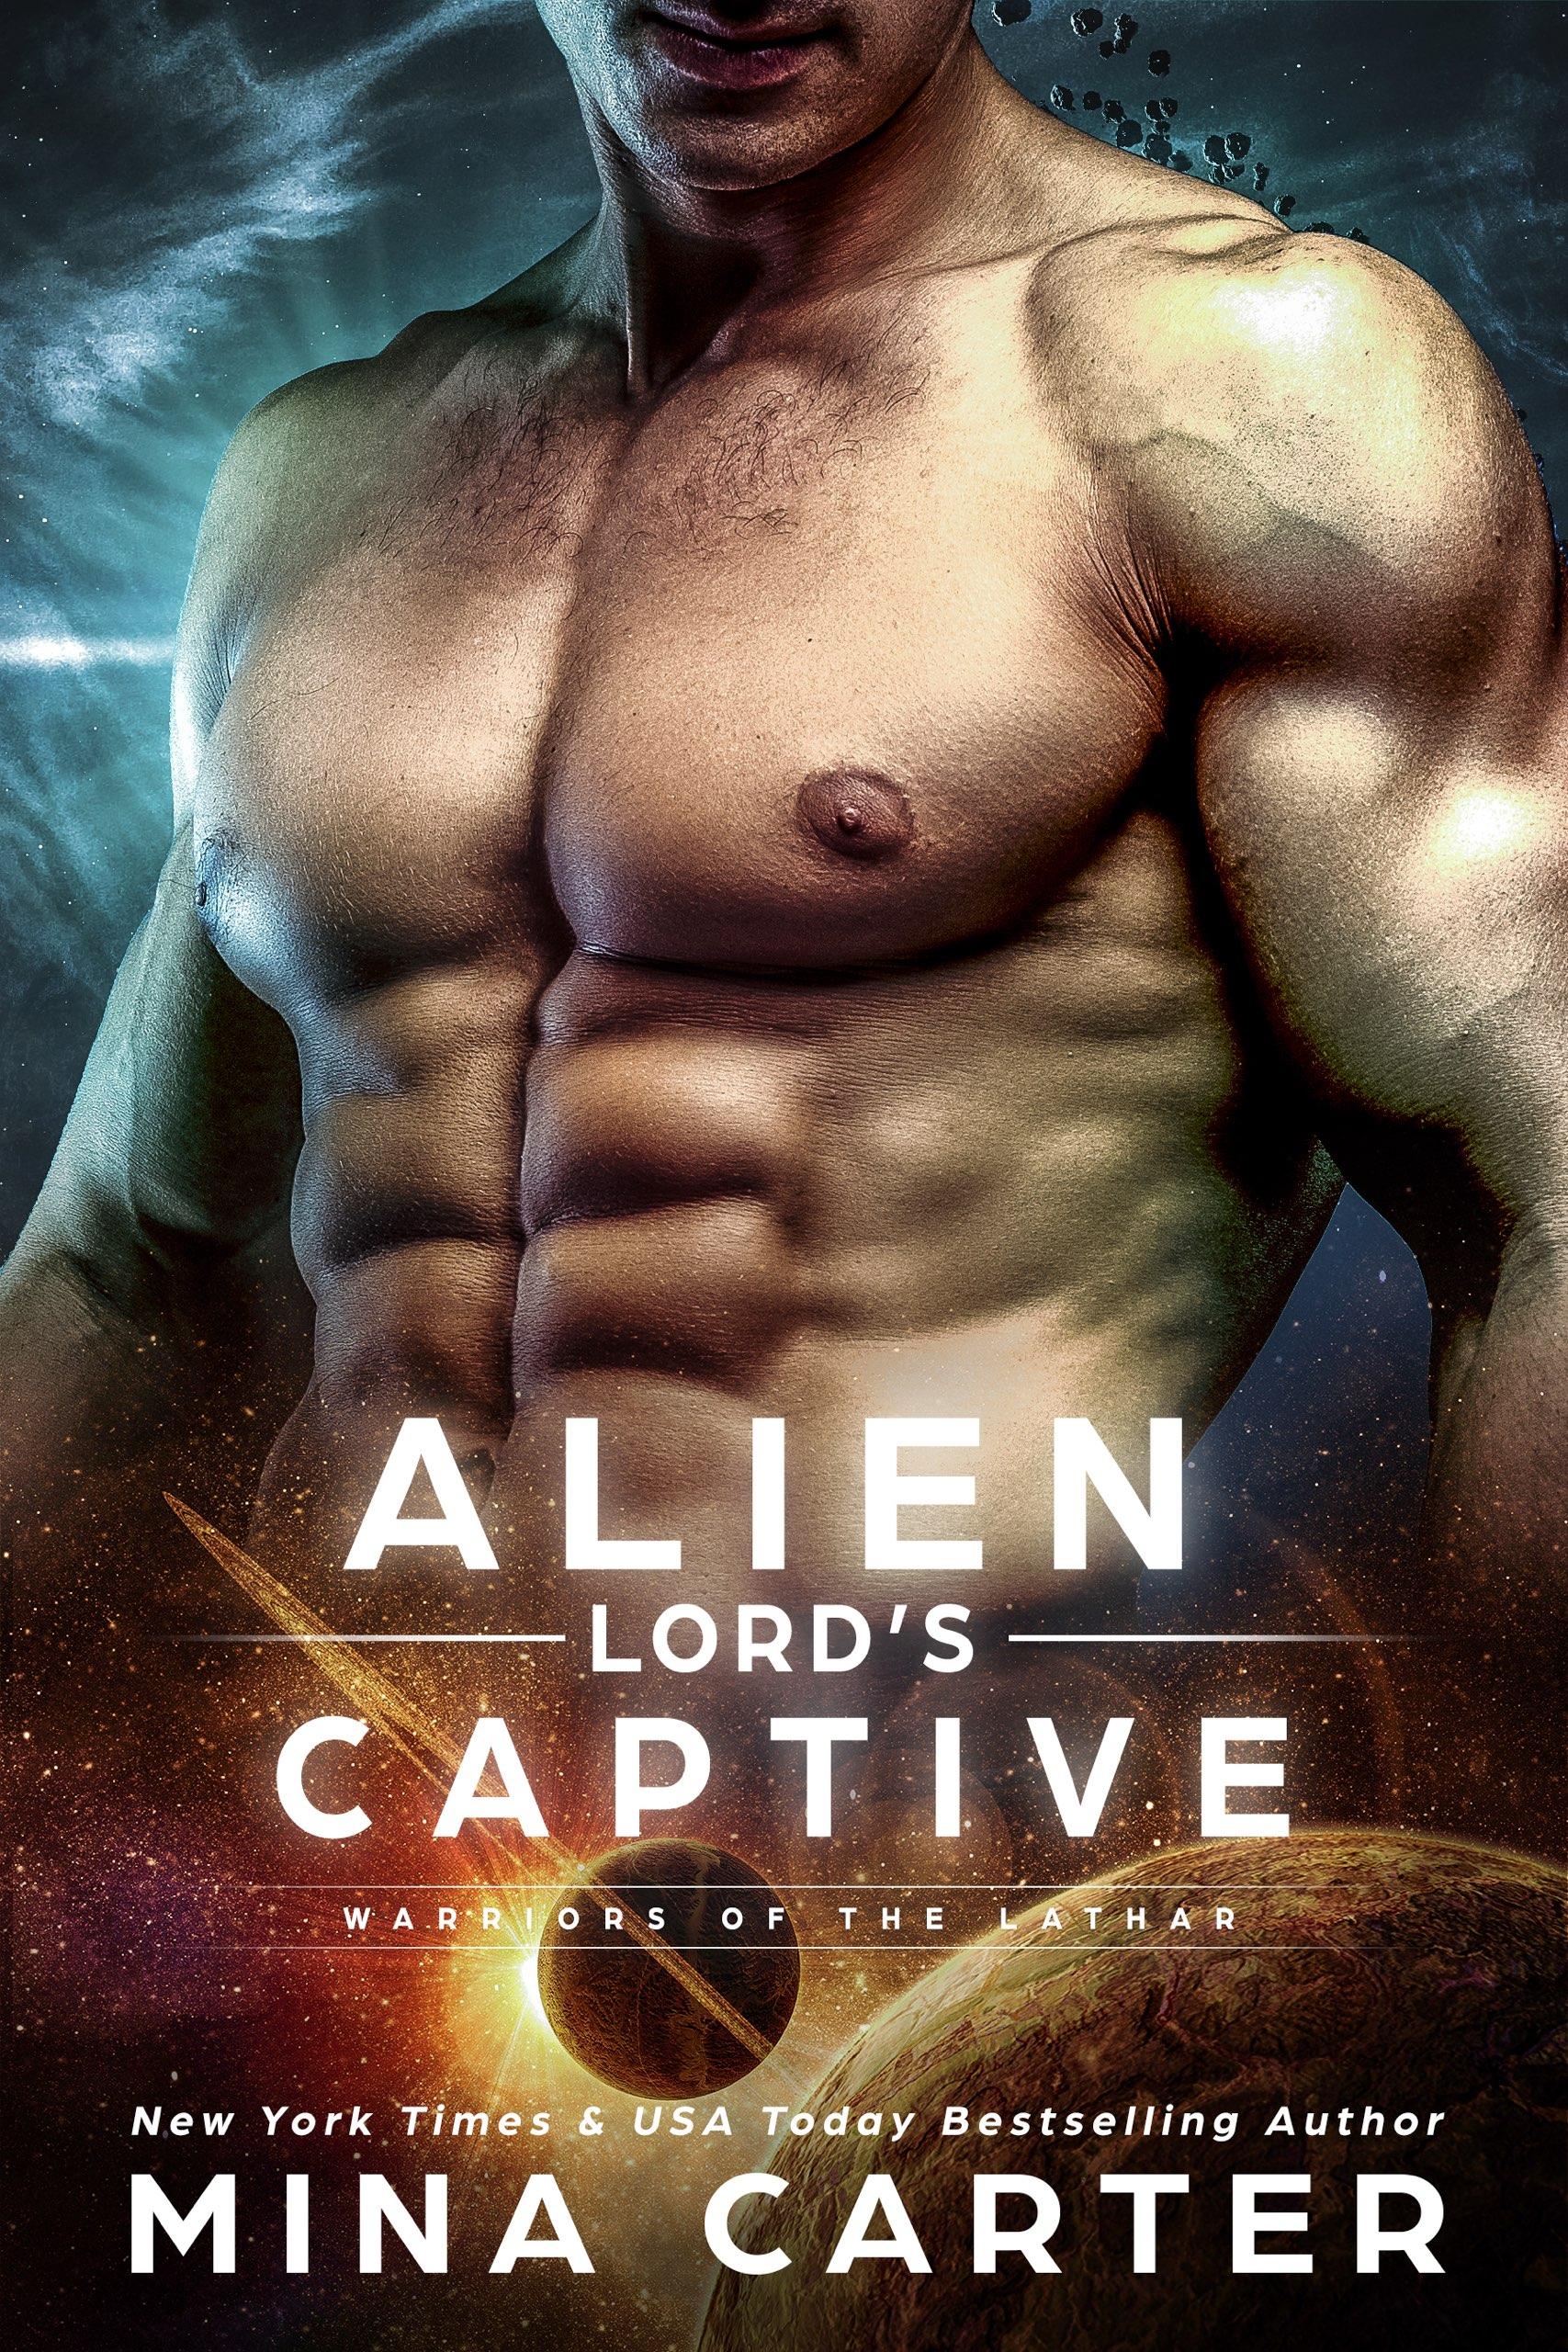 Alien-Lords-Captive-Generic.jpg